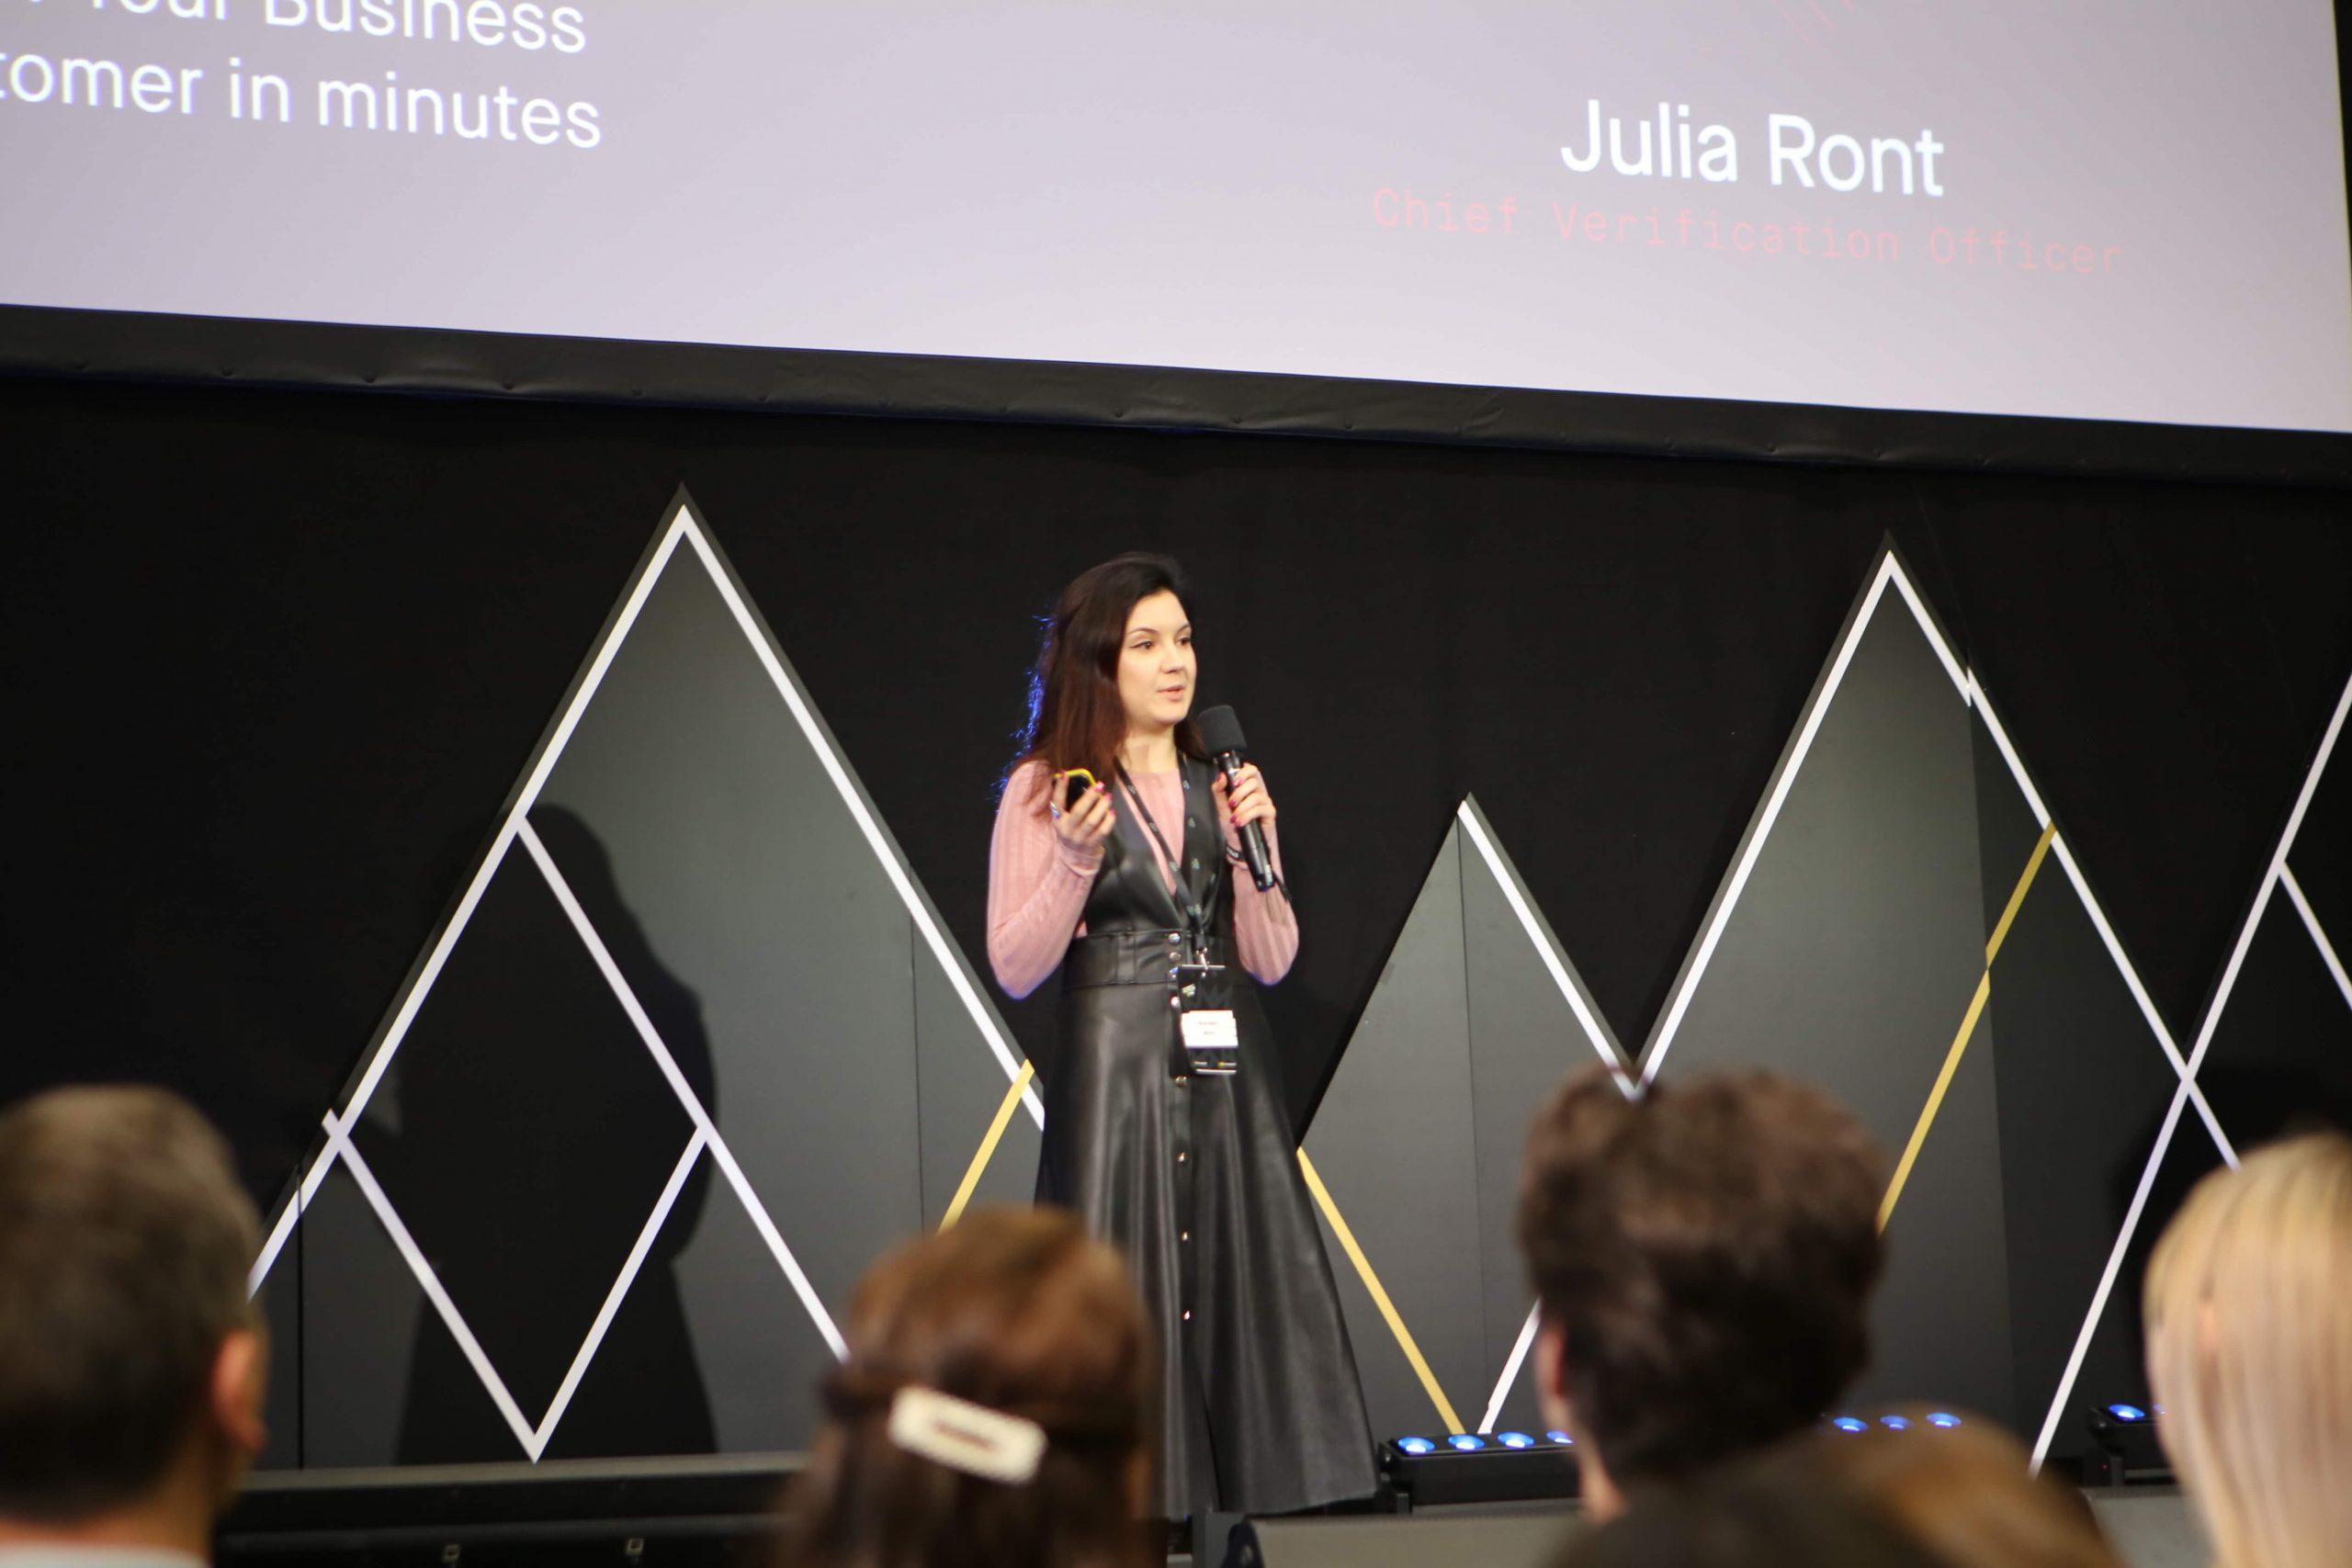 Julia Ront